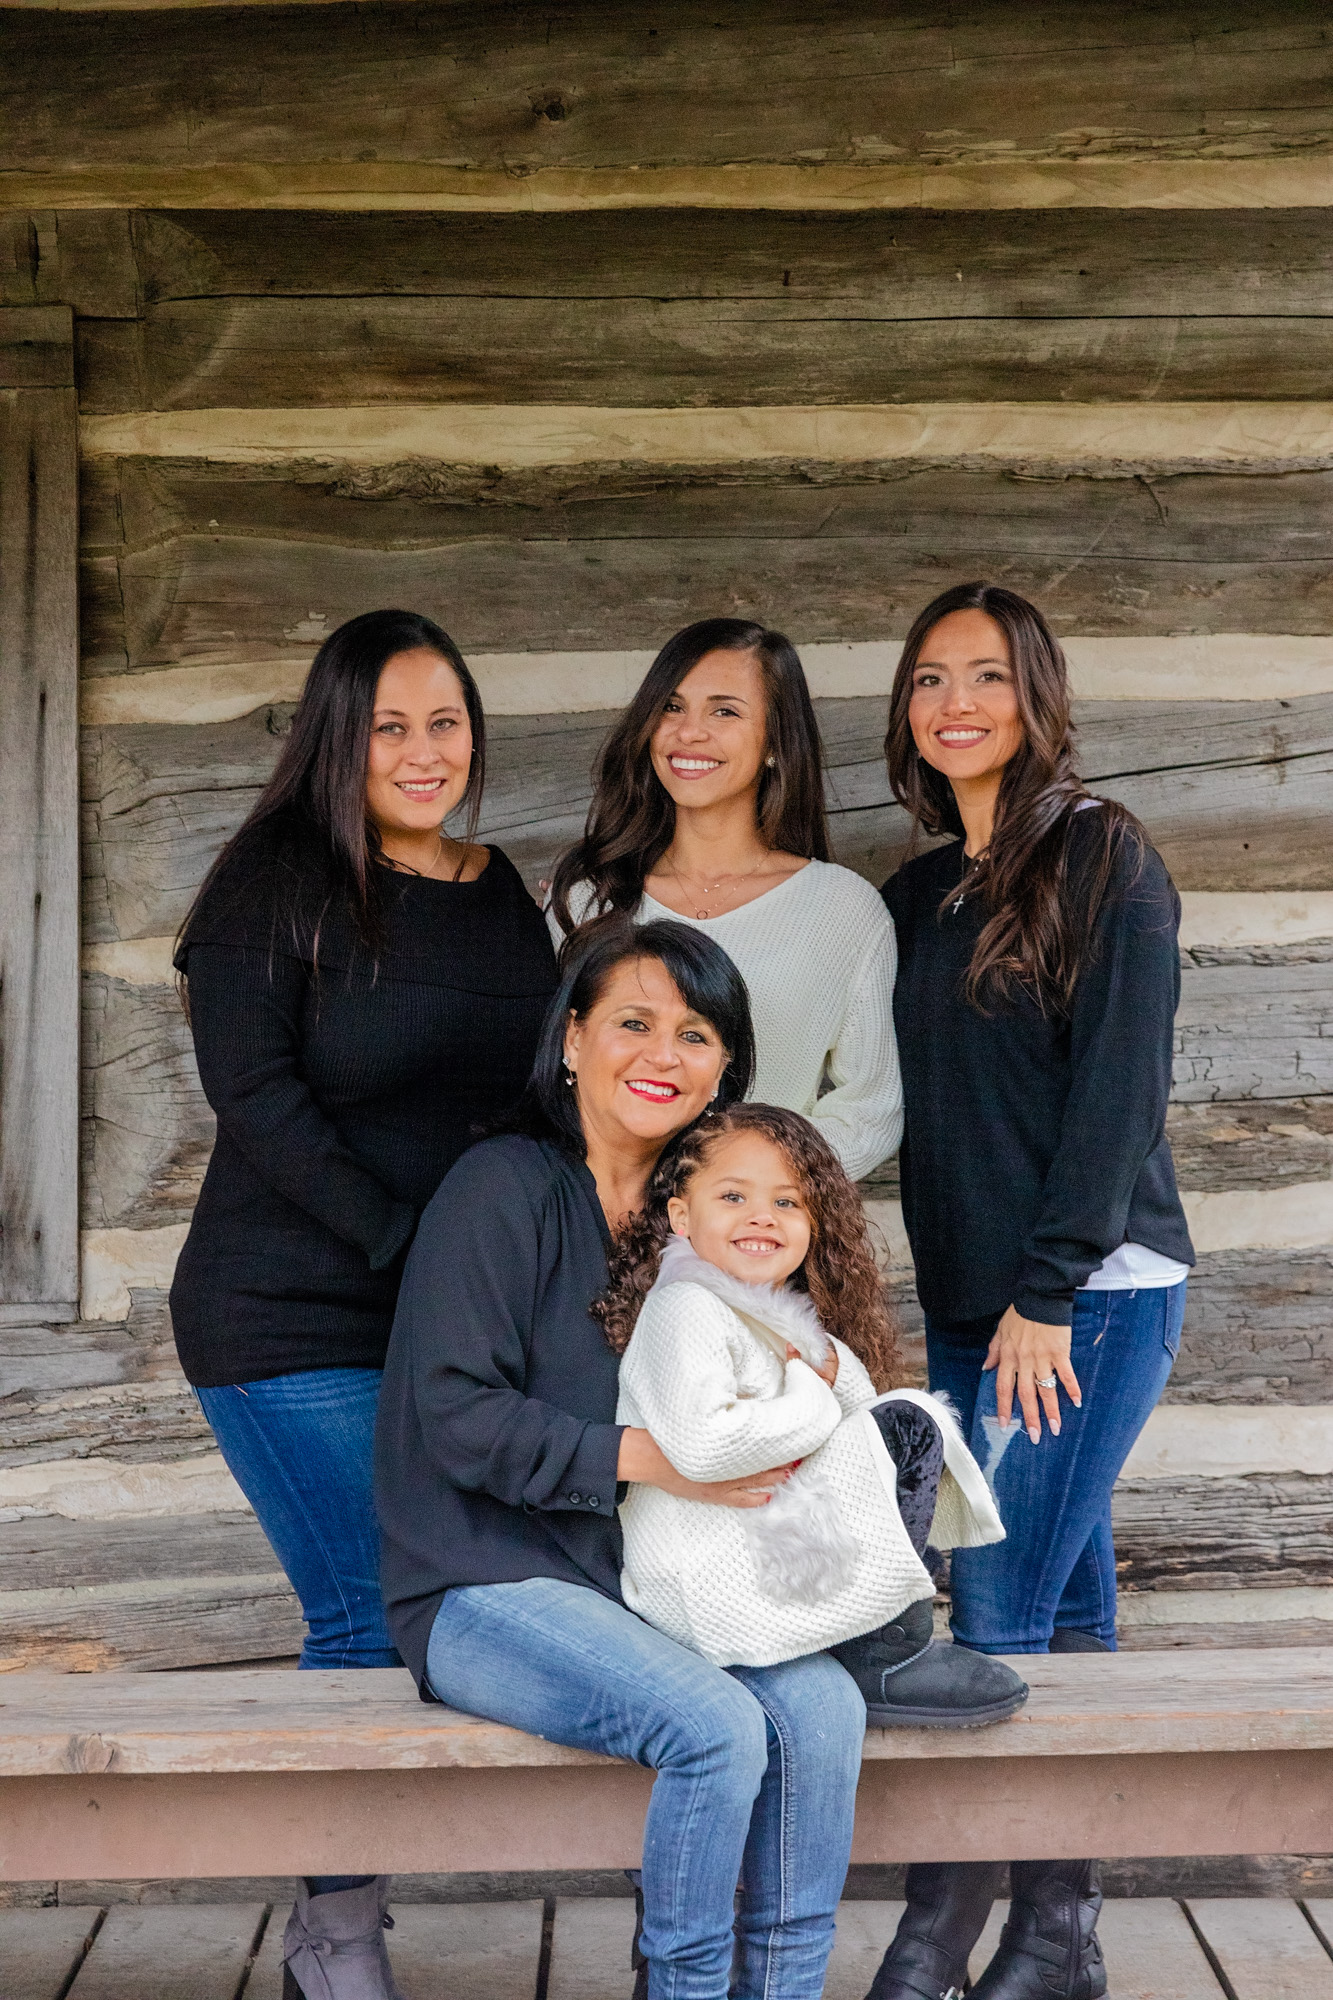 FamilyPortraits_2018-11.jpg